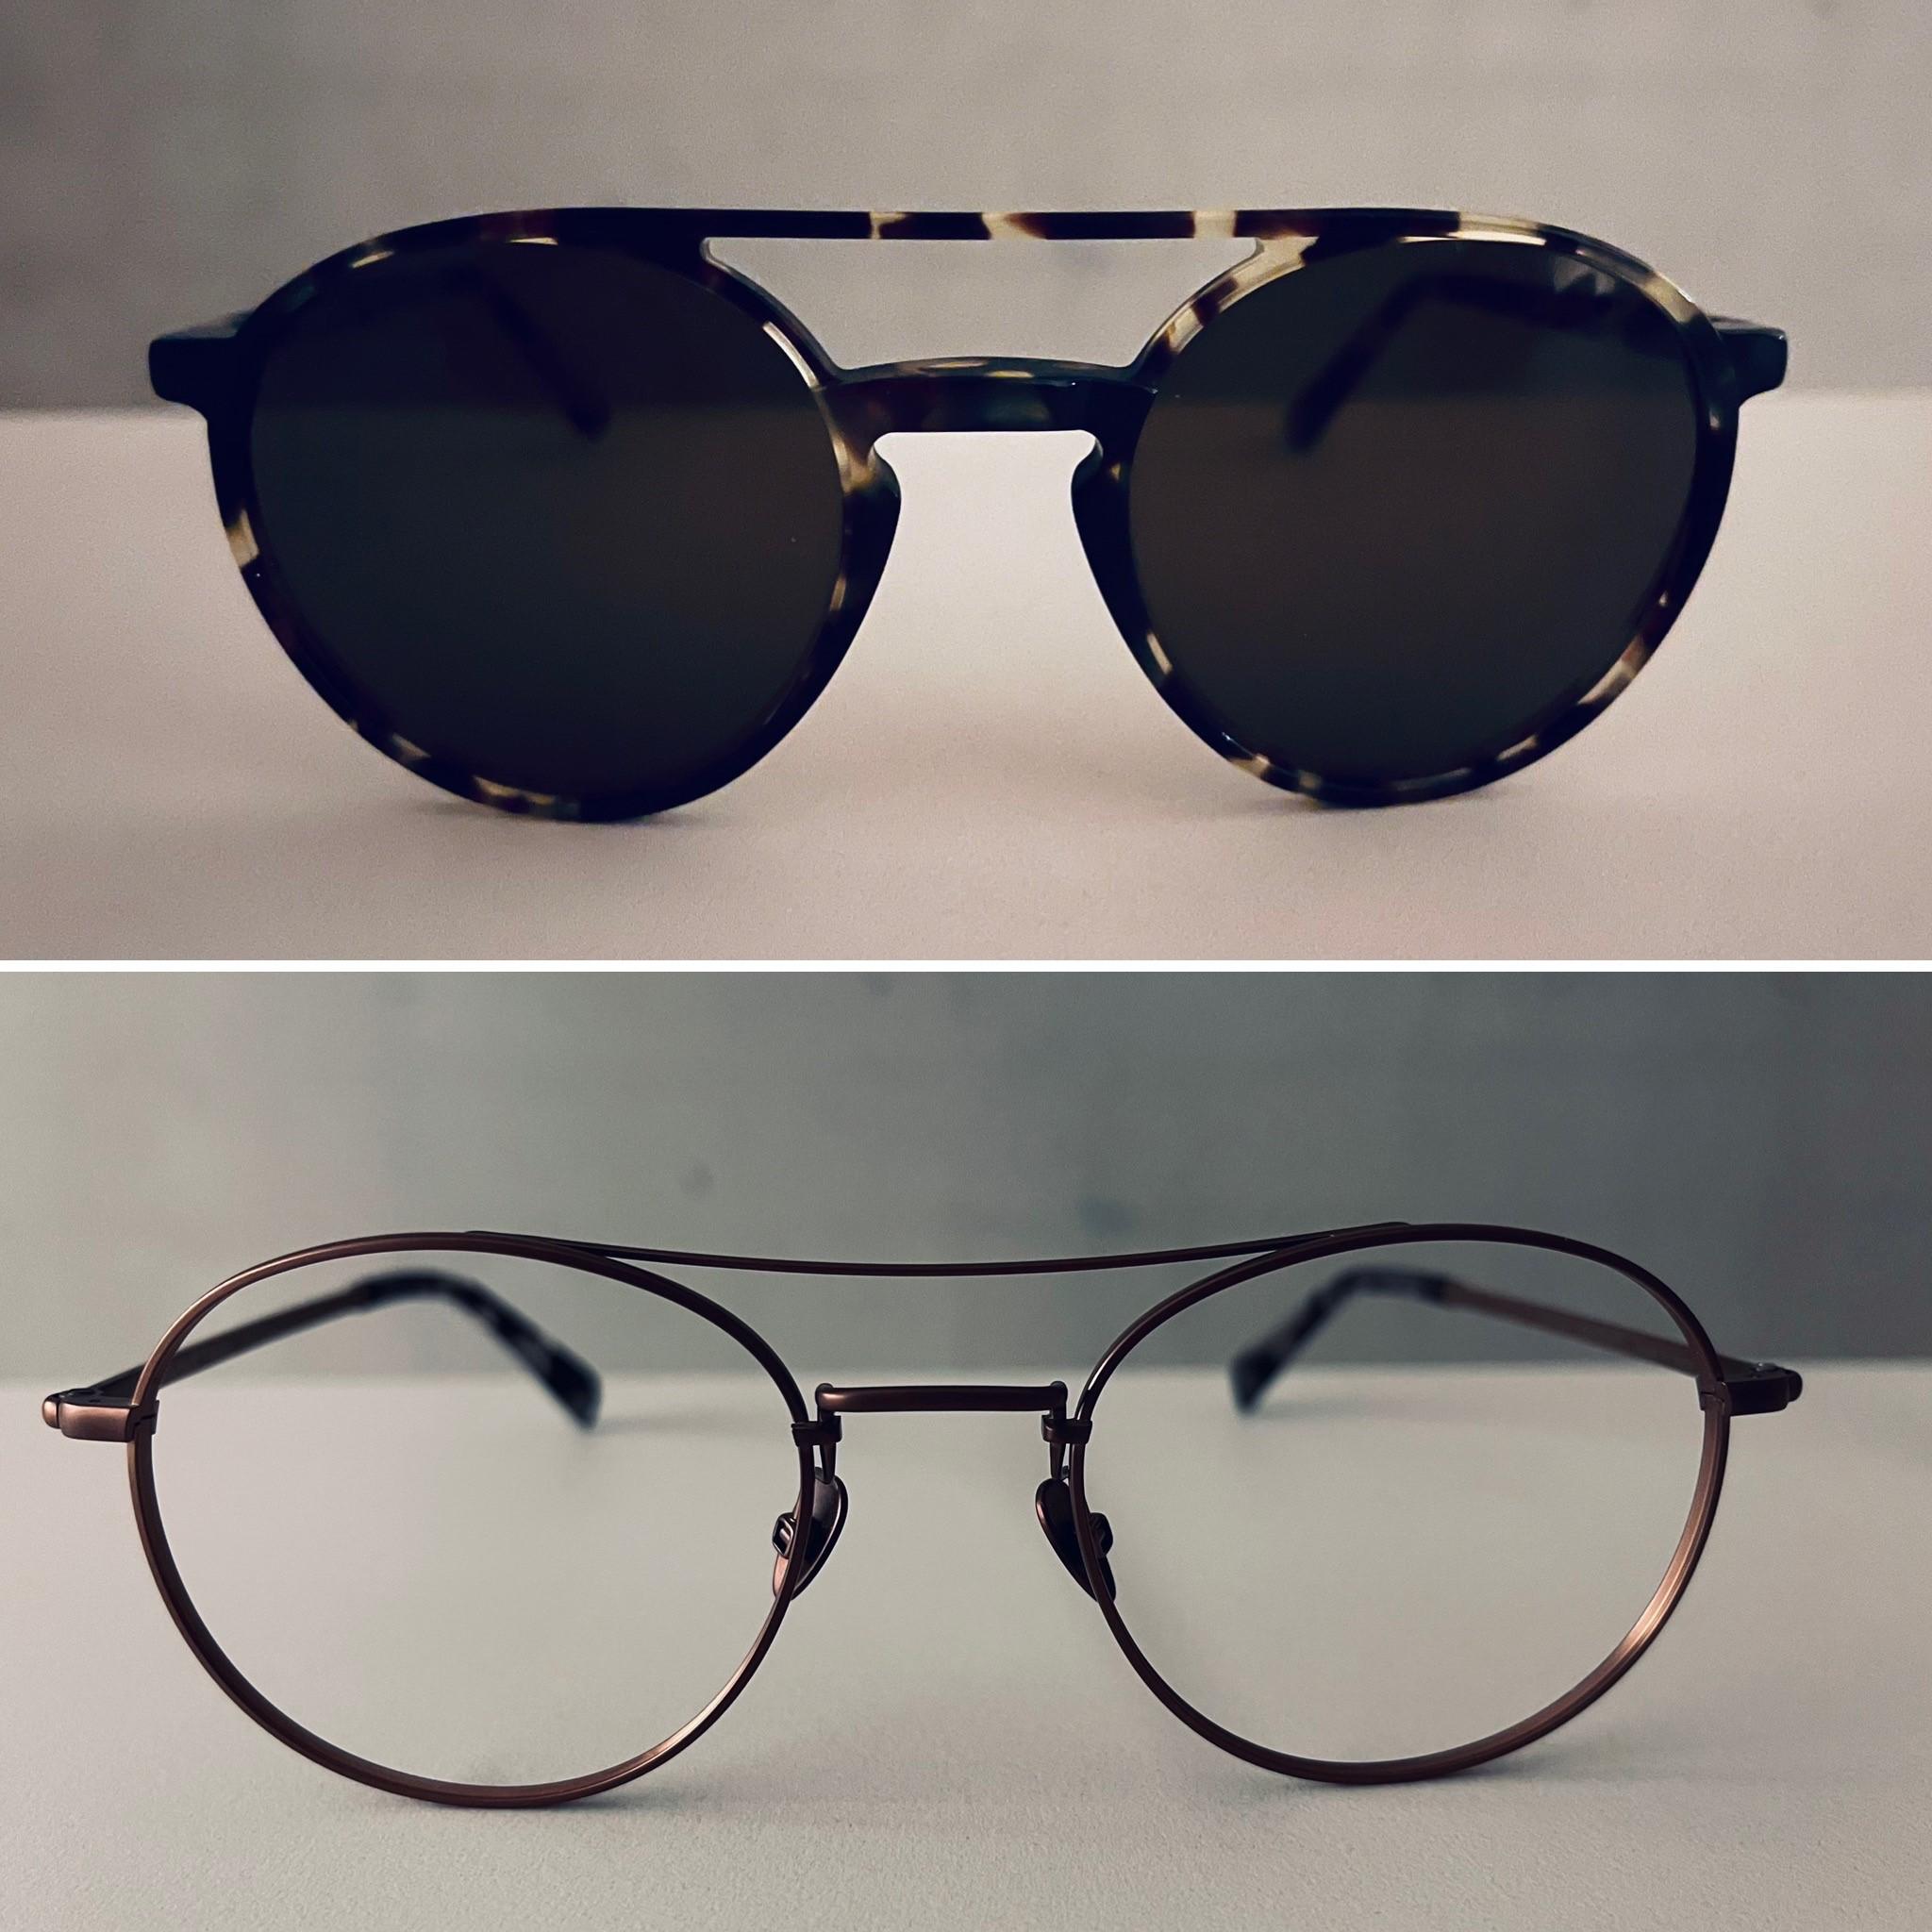 BLOG Trends 2021 Optiker Augensache Friedberg Schildpatt by Optiker Augensache Brille Sonnenbrille Kontaktlinse Friedberg_Modern Retro